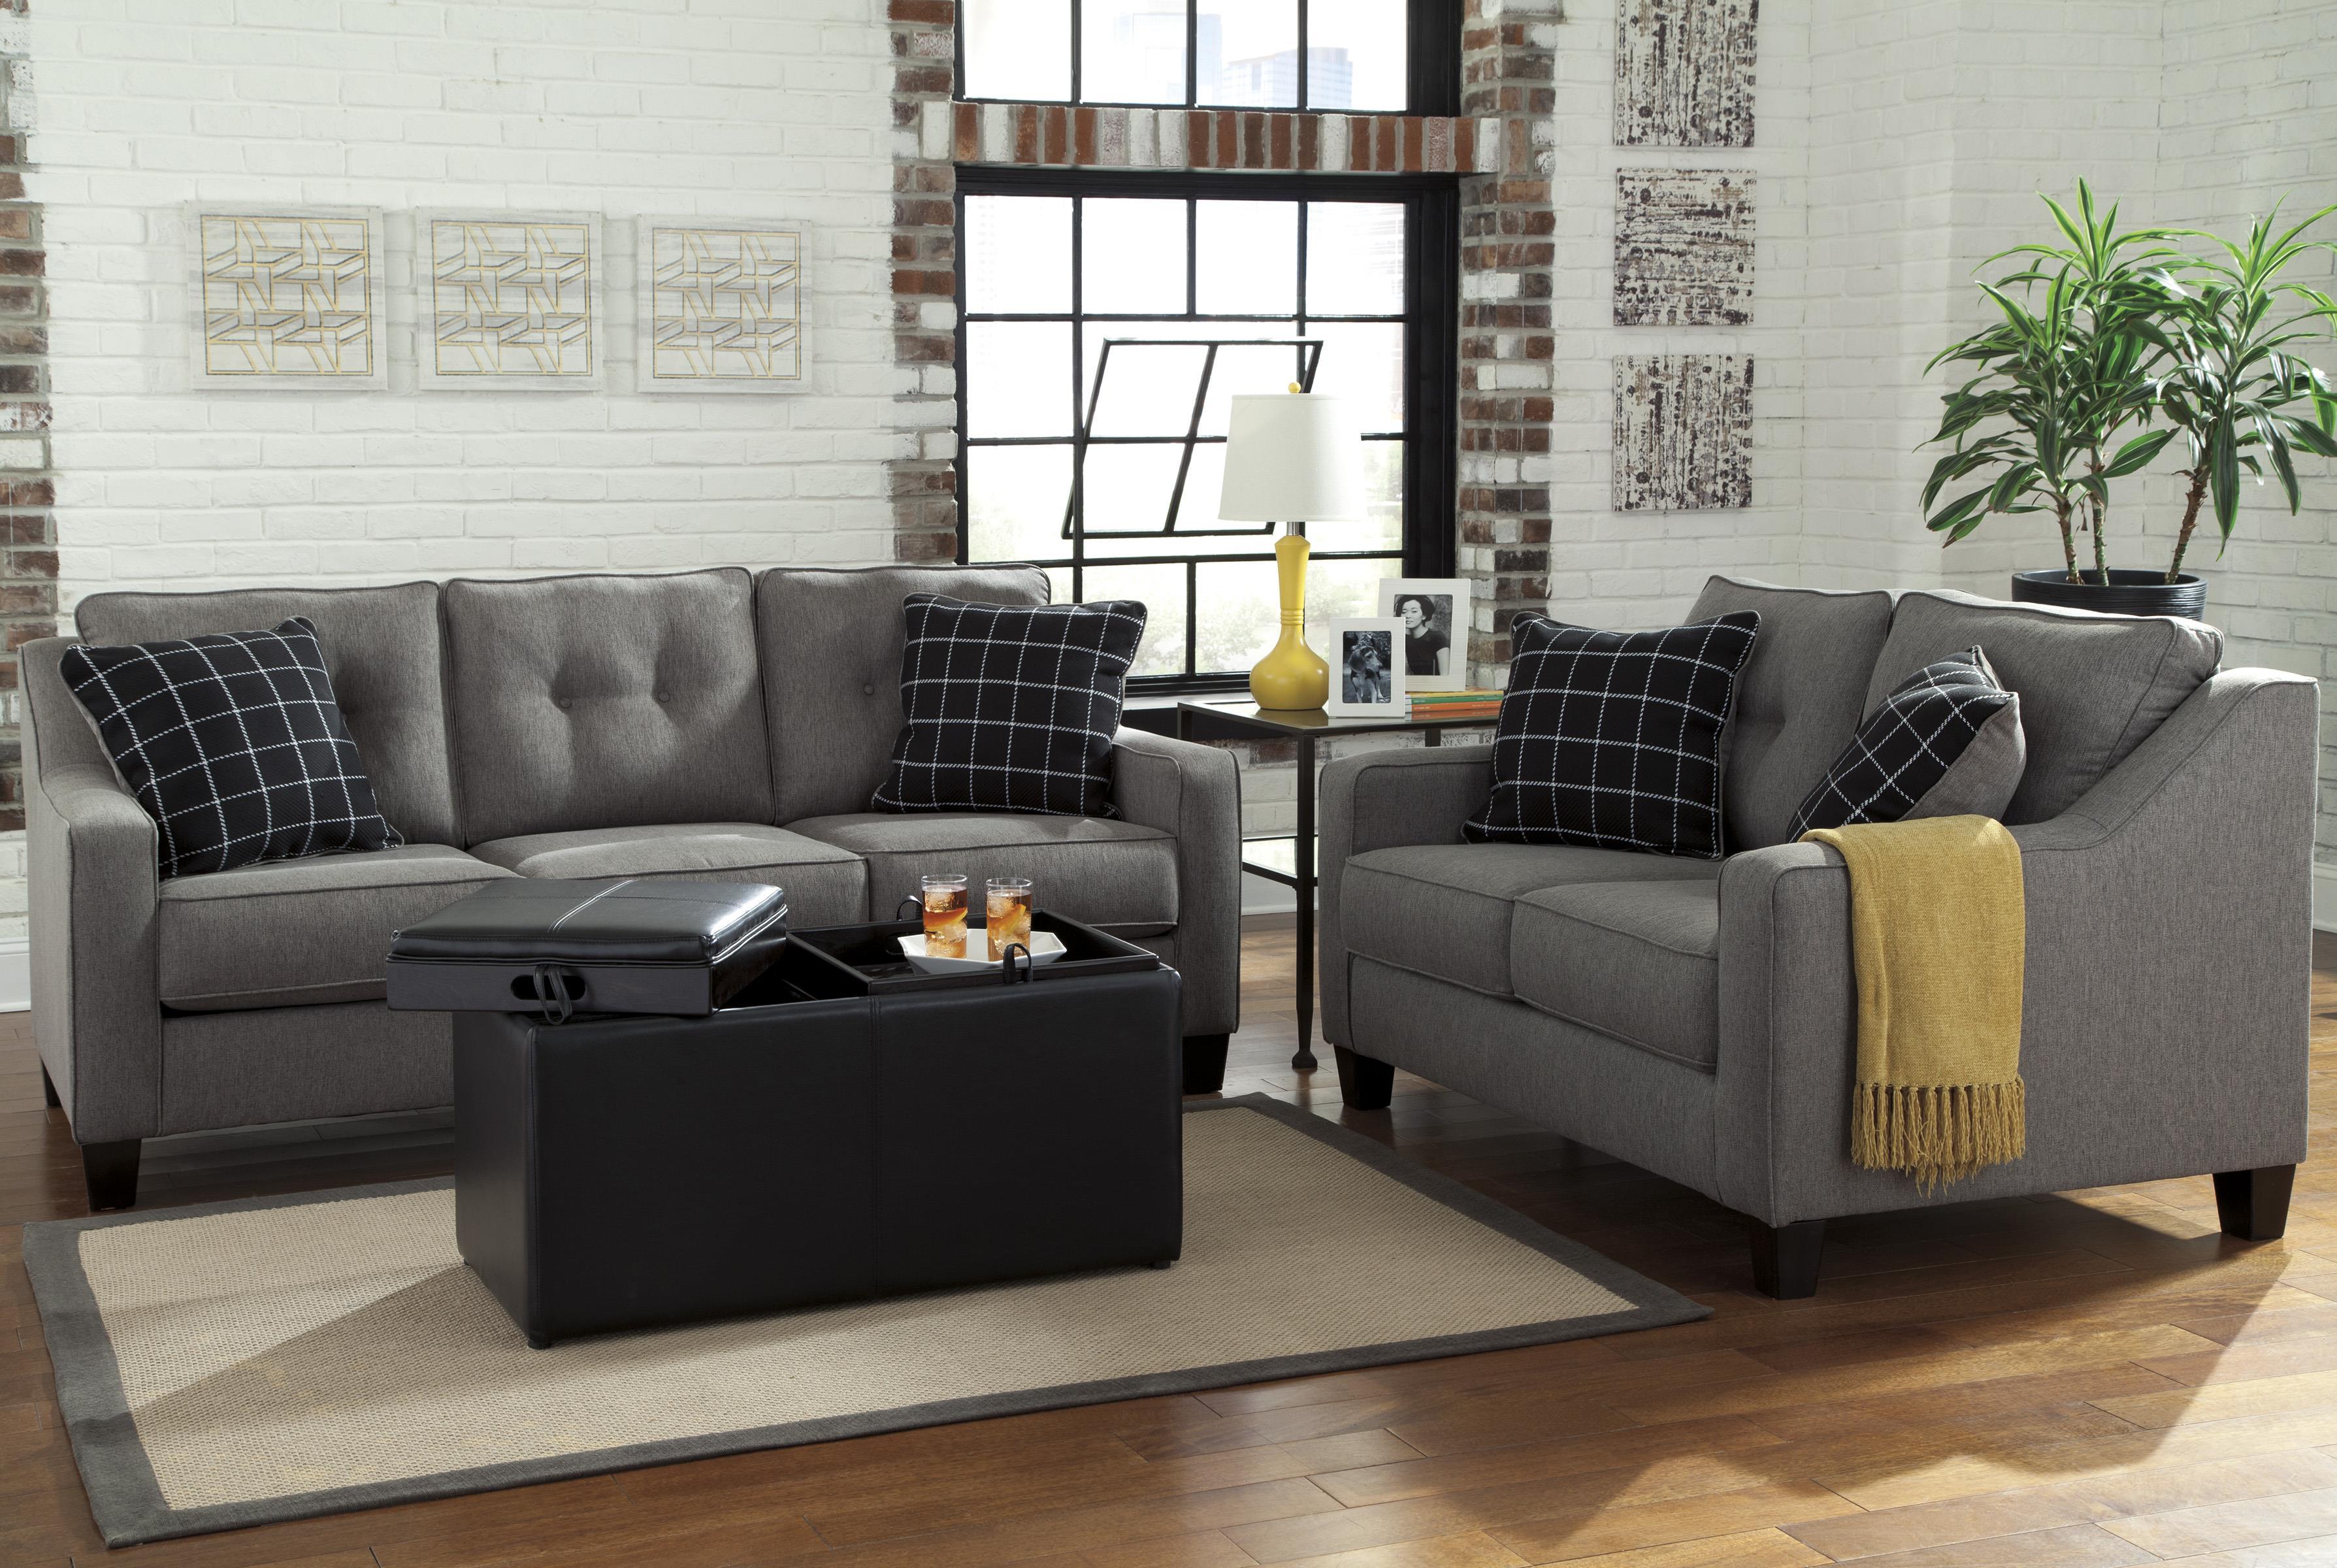 Marlo Furniture Warehouse Forestville Md